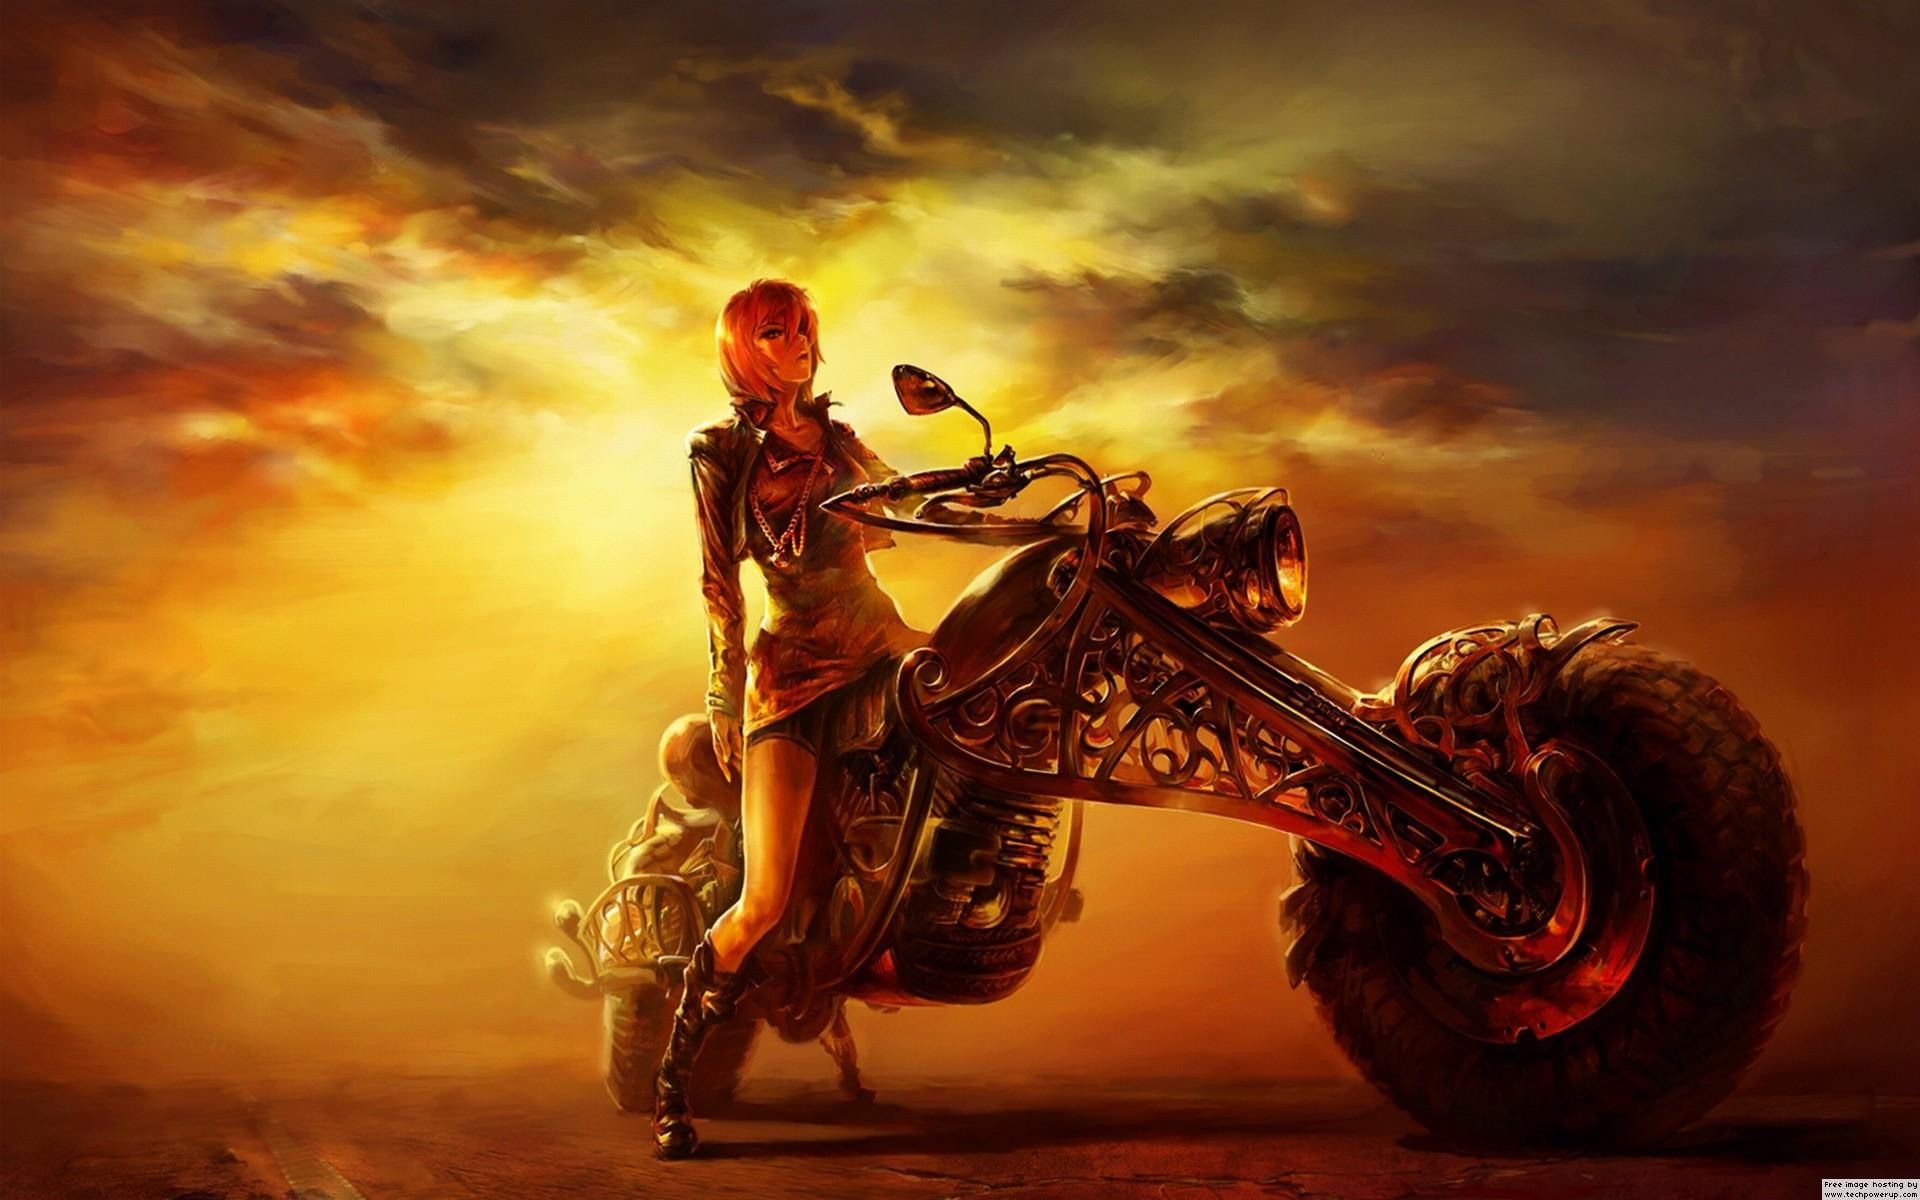 Lady Biker – Fantasy Wallpaper ID 103999 – Desktop Nexus Abstract